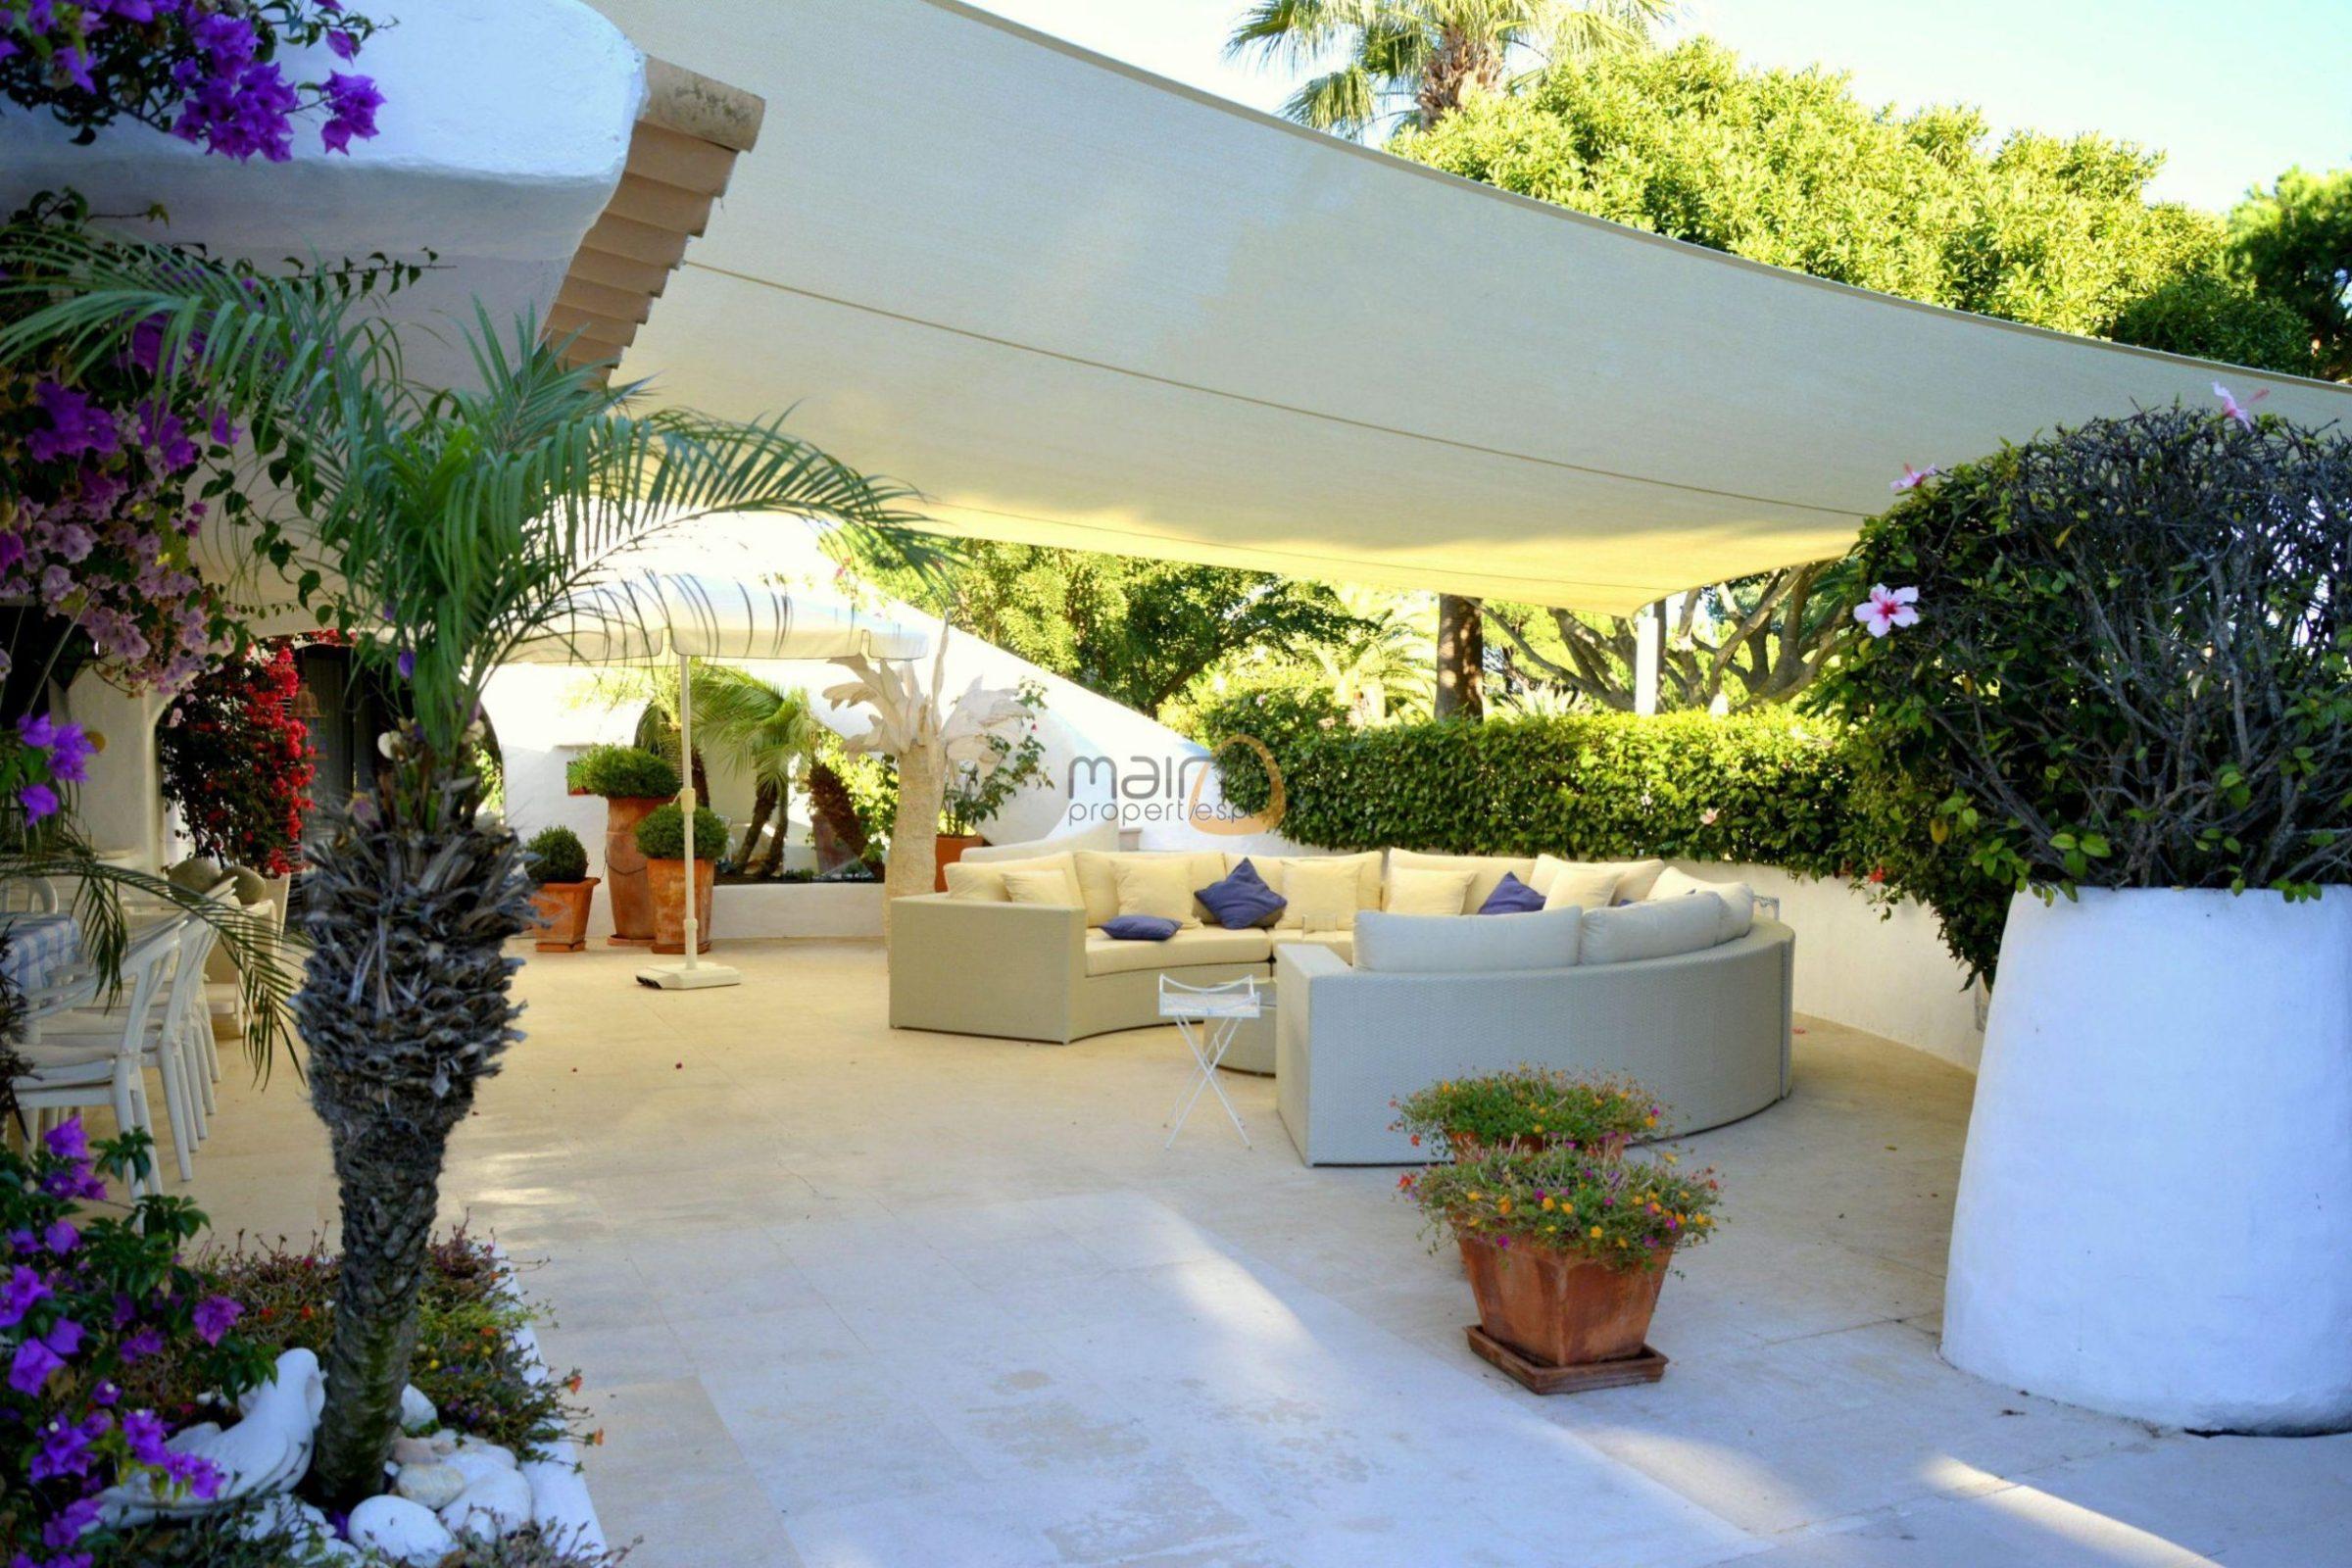 [:pt]Moradia com 5 quartos na Quinta do Lago :: Piscina 4 :: MainProperties :: 020061[:en]5 bedroom villa  in Quinta do Lago :: Pool 3 :: MainProperties :: 020061[:]